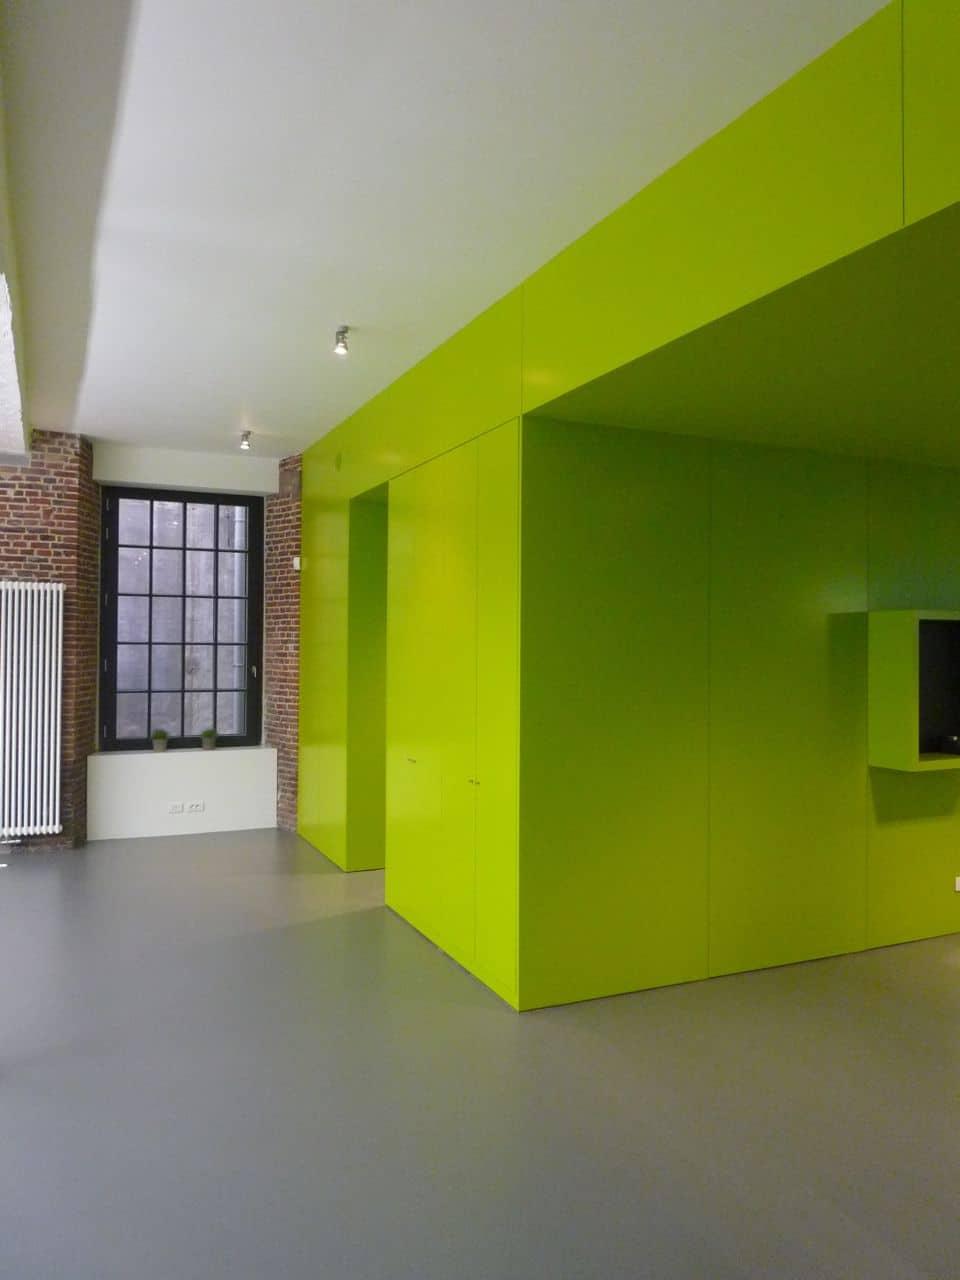 P1060685 | Baeyens & Beck architecten Gent | architect nieuwbouw renovatie interieur | high end | architectenbureau